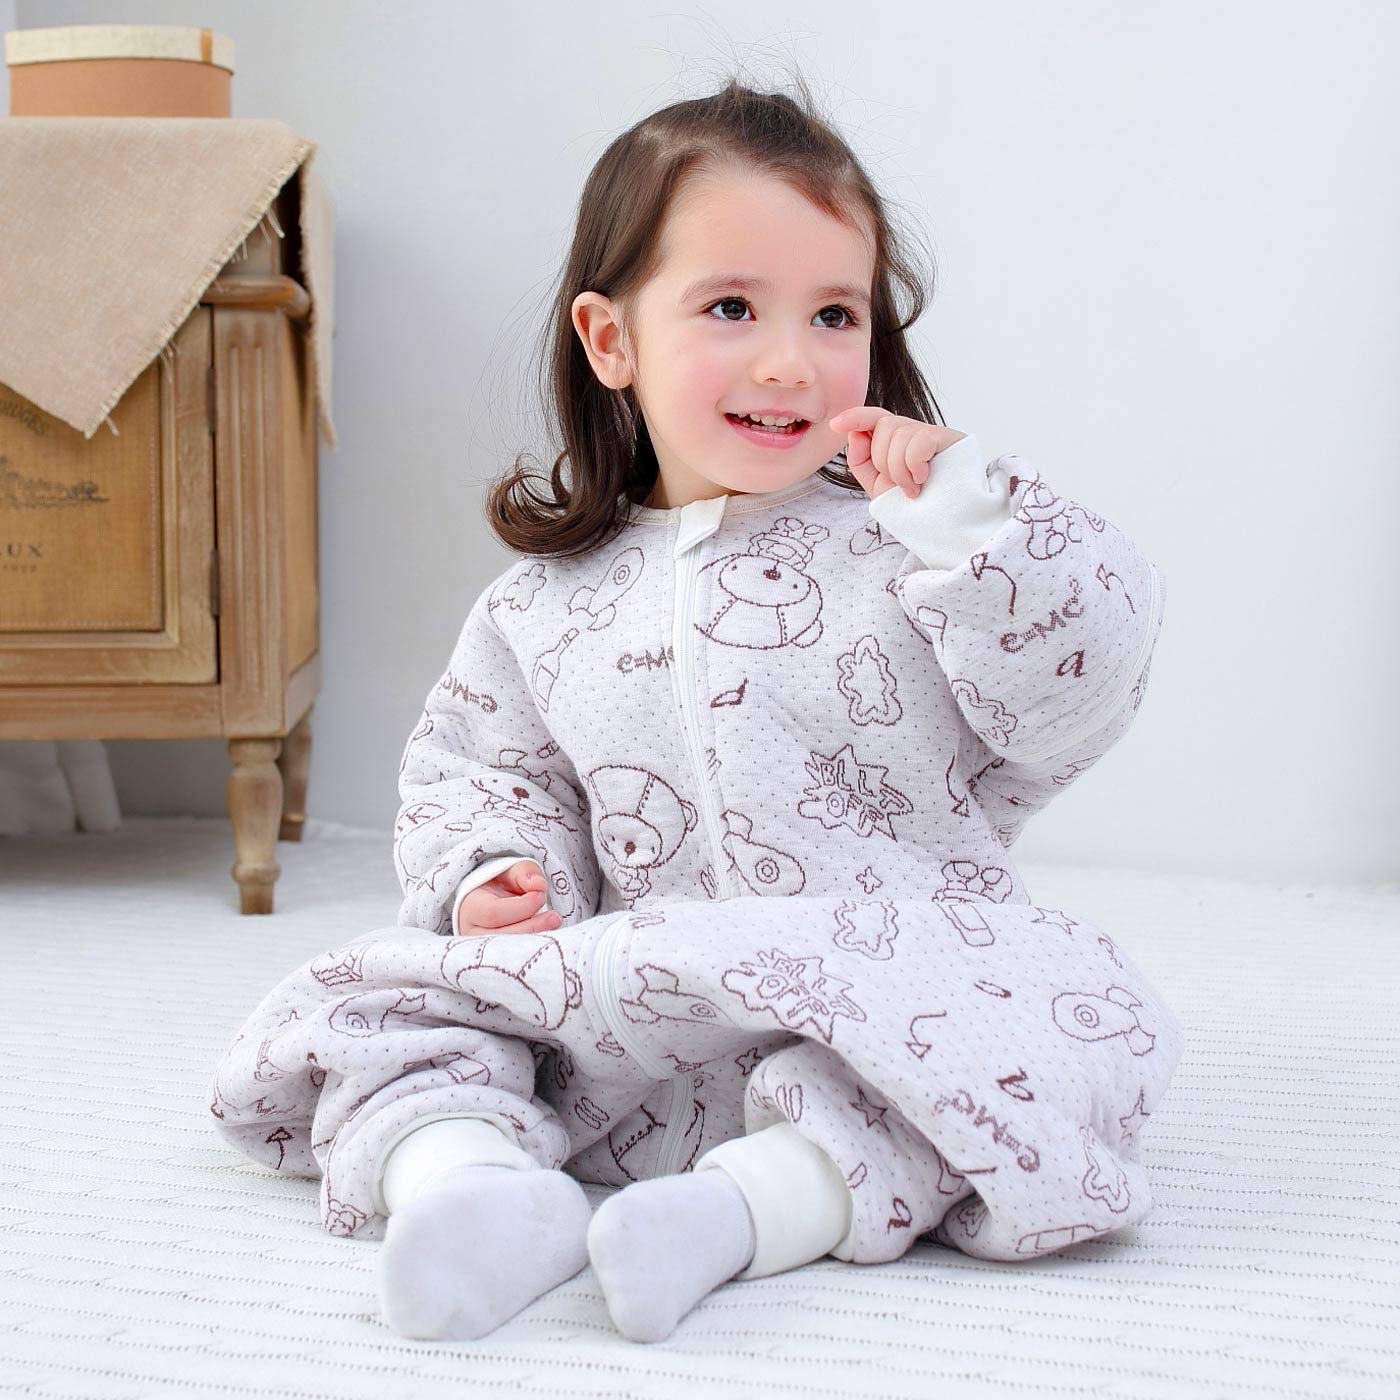 Happy Cherry 0-1 A/ños Saco de Dormir de Algod/ón para Beb/é Ni/ños Infantil Pijama Entero Transpirable Caliente para Oto/ño Invierno 1-2.5 TOG